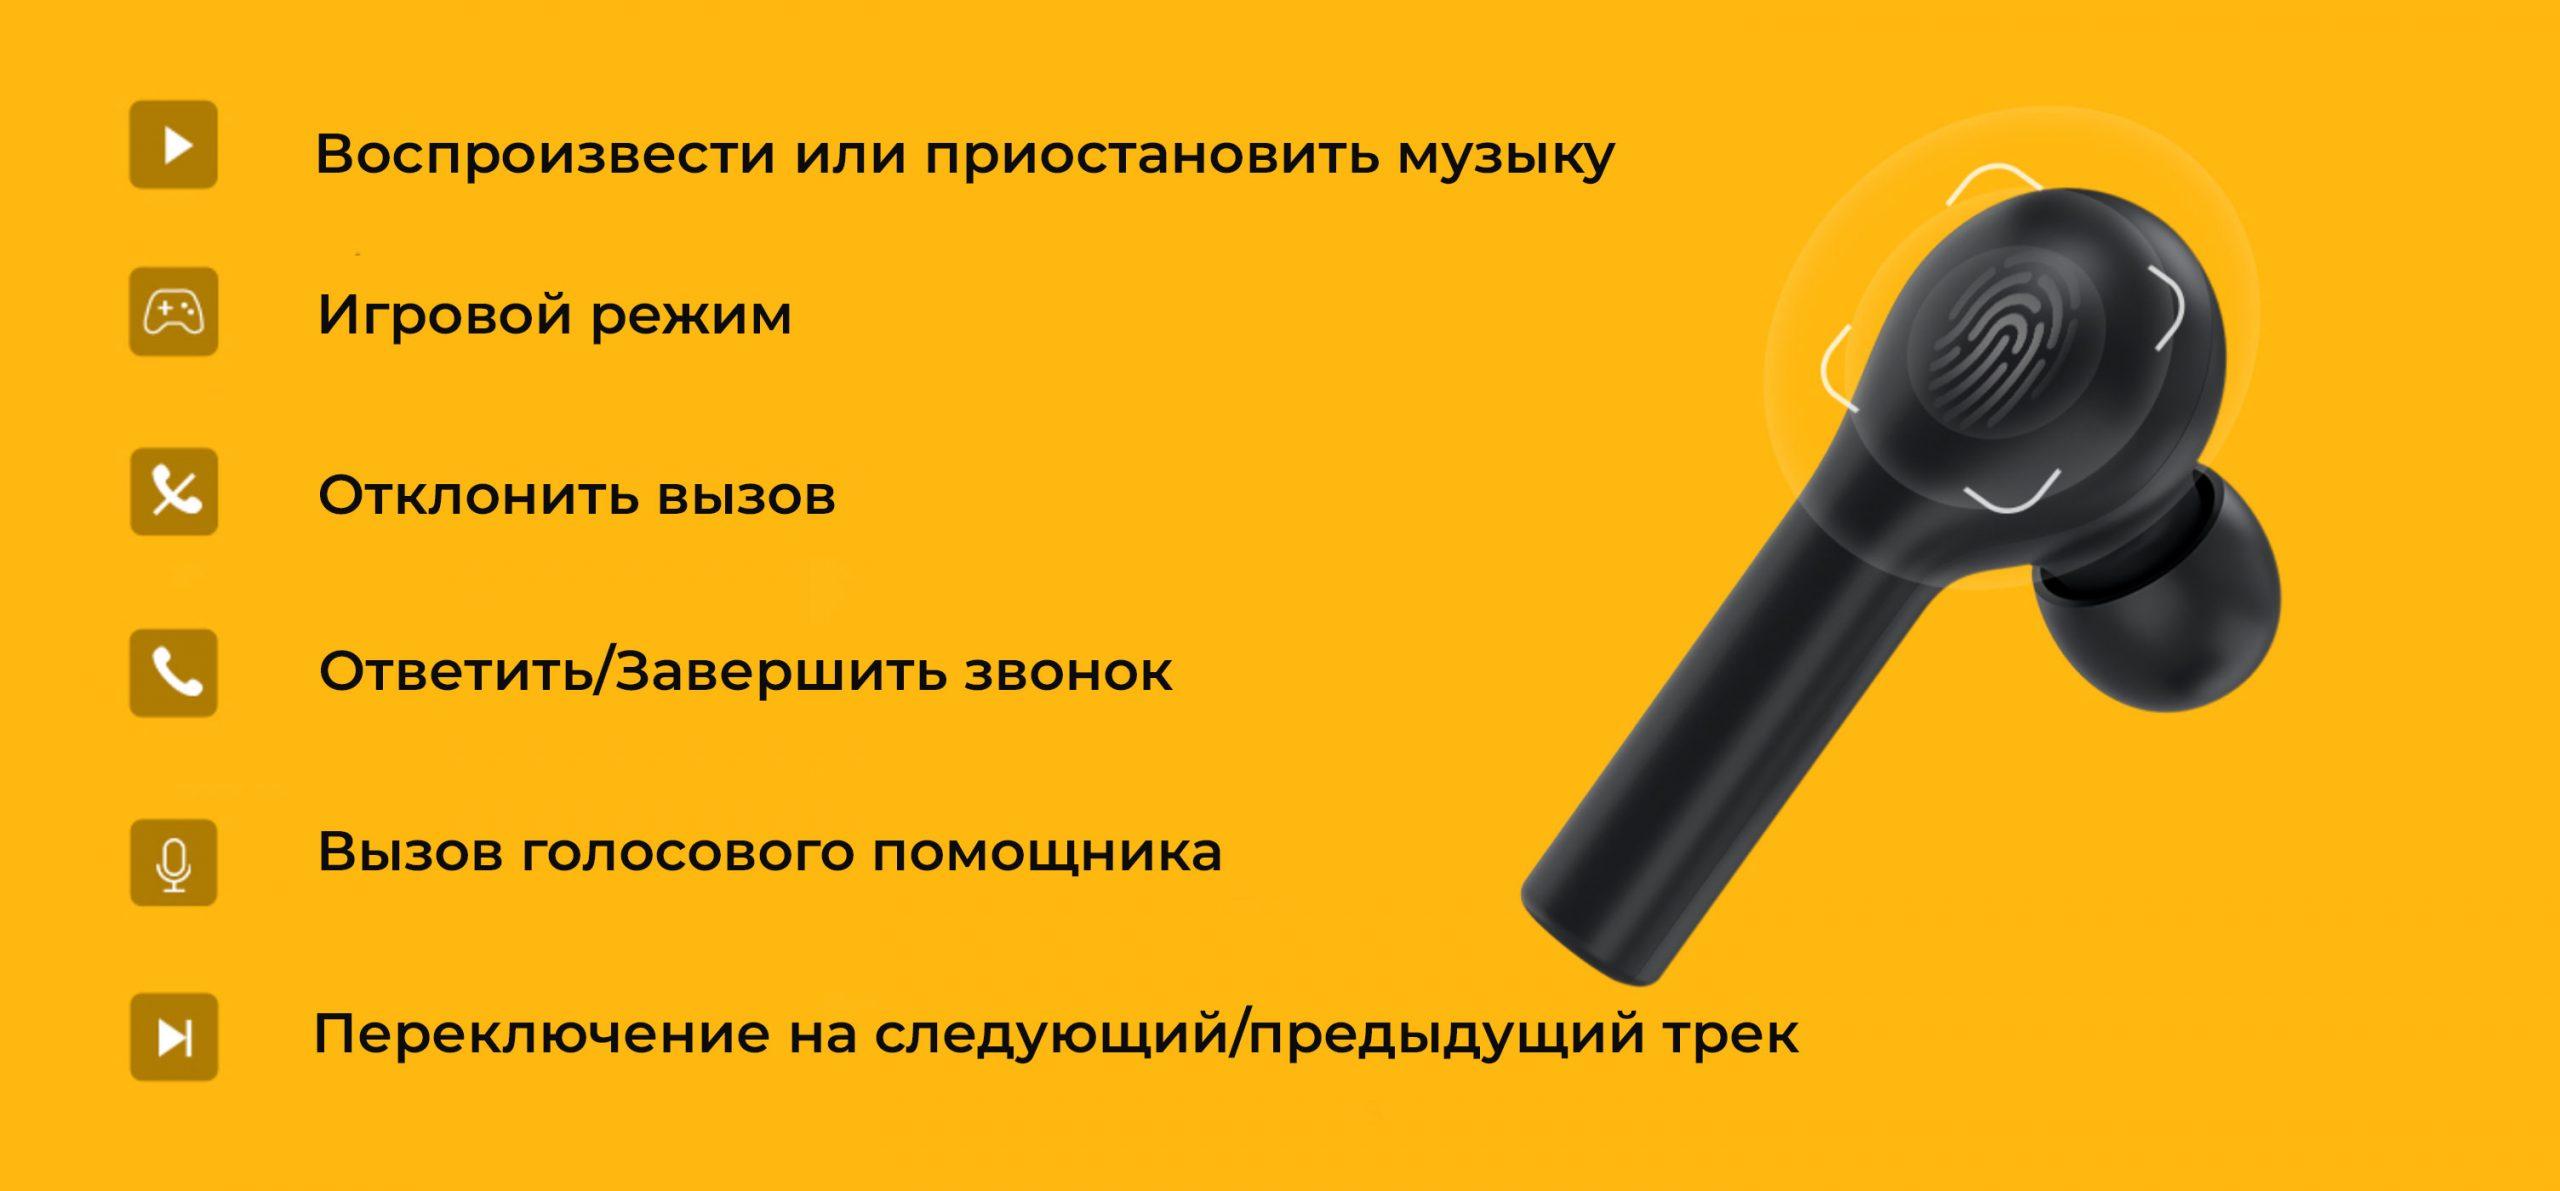 Opisanie Besprovodnye Naushniki Xiaomi Qcy T5s 2